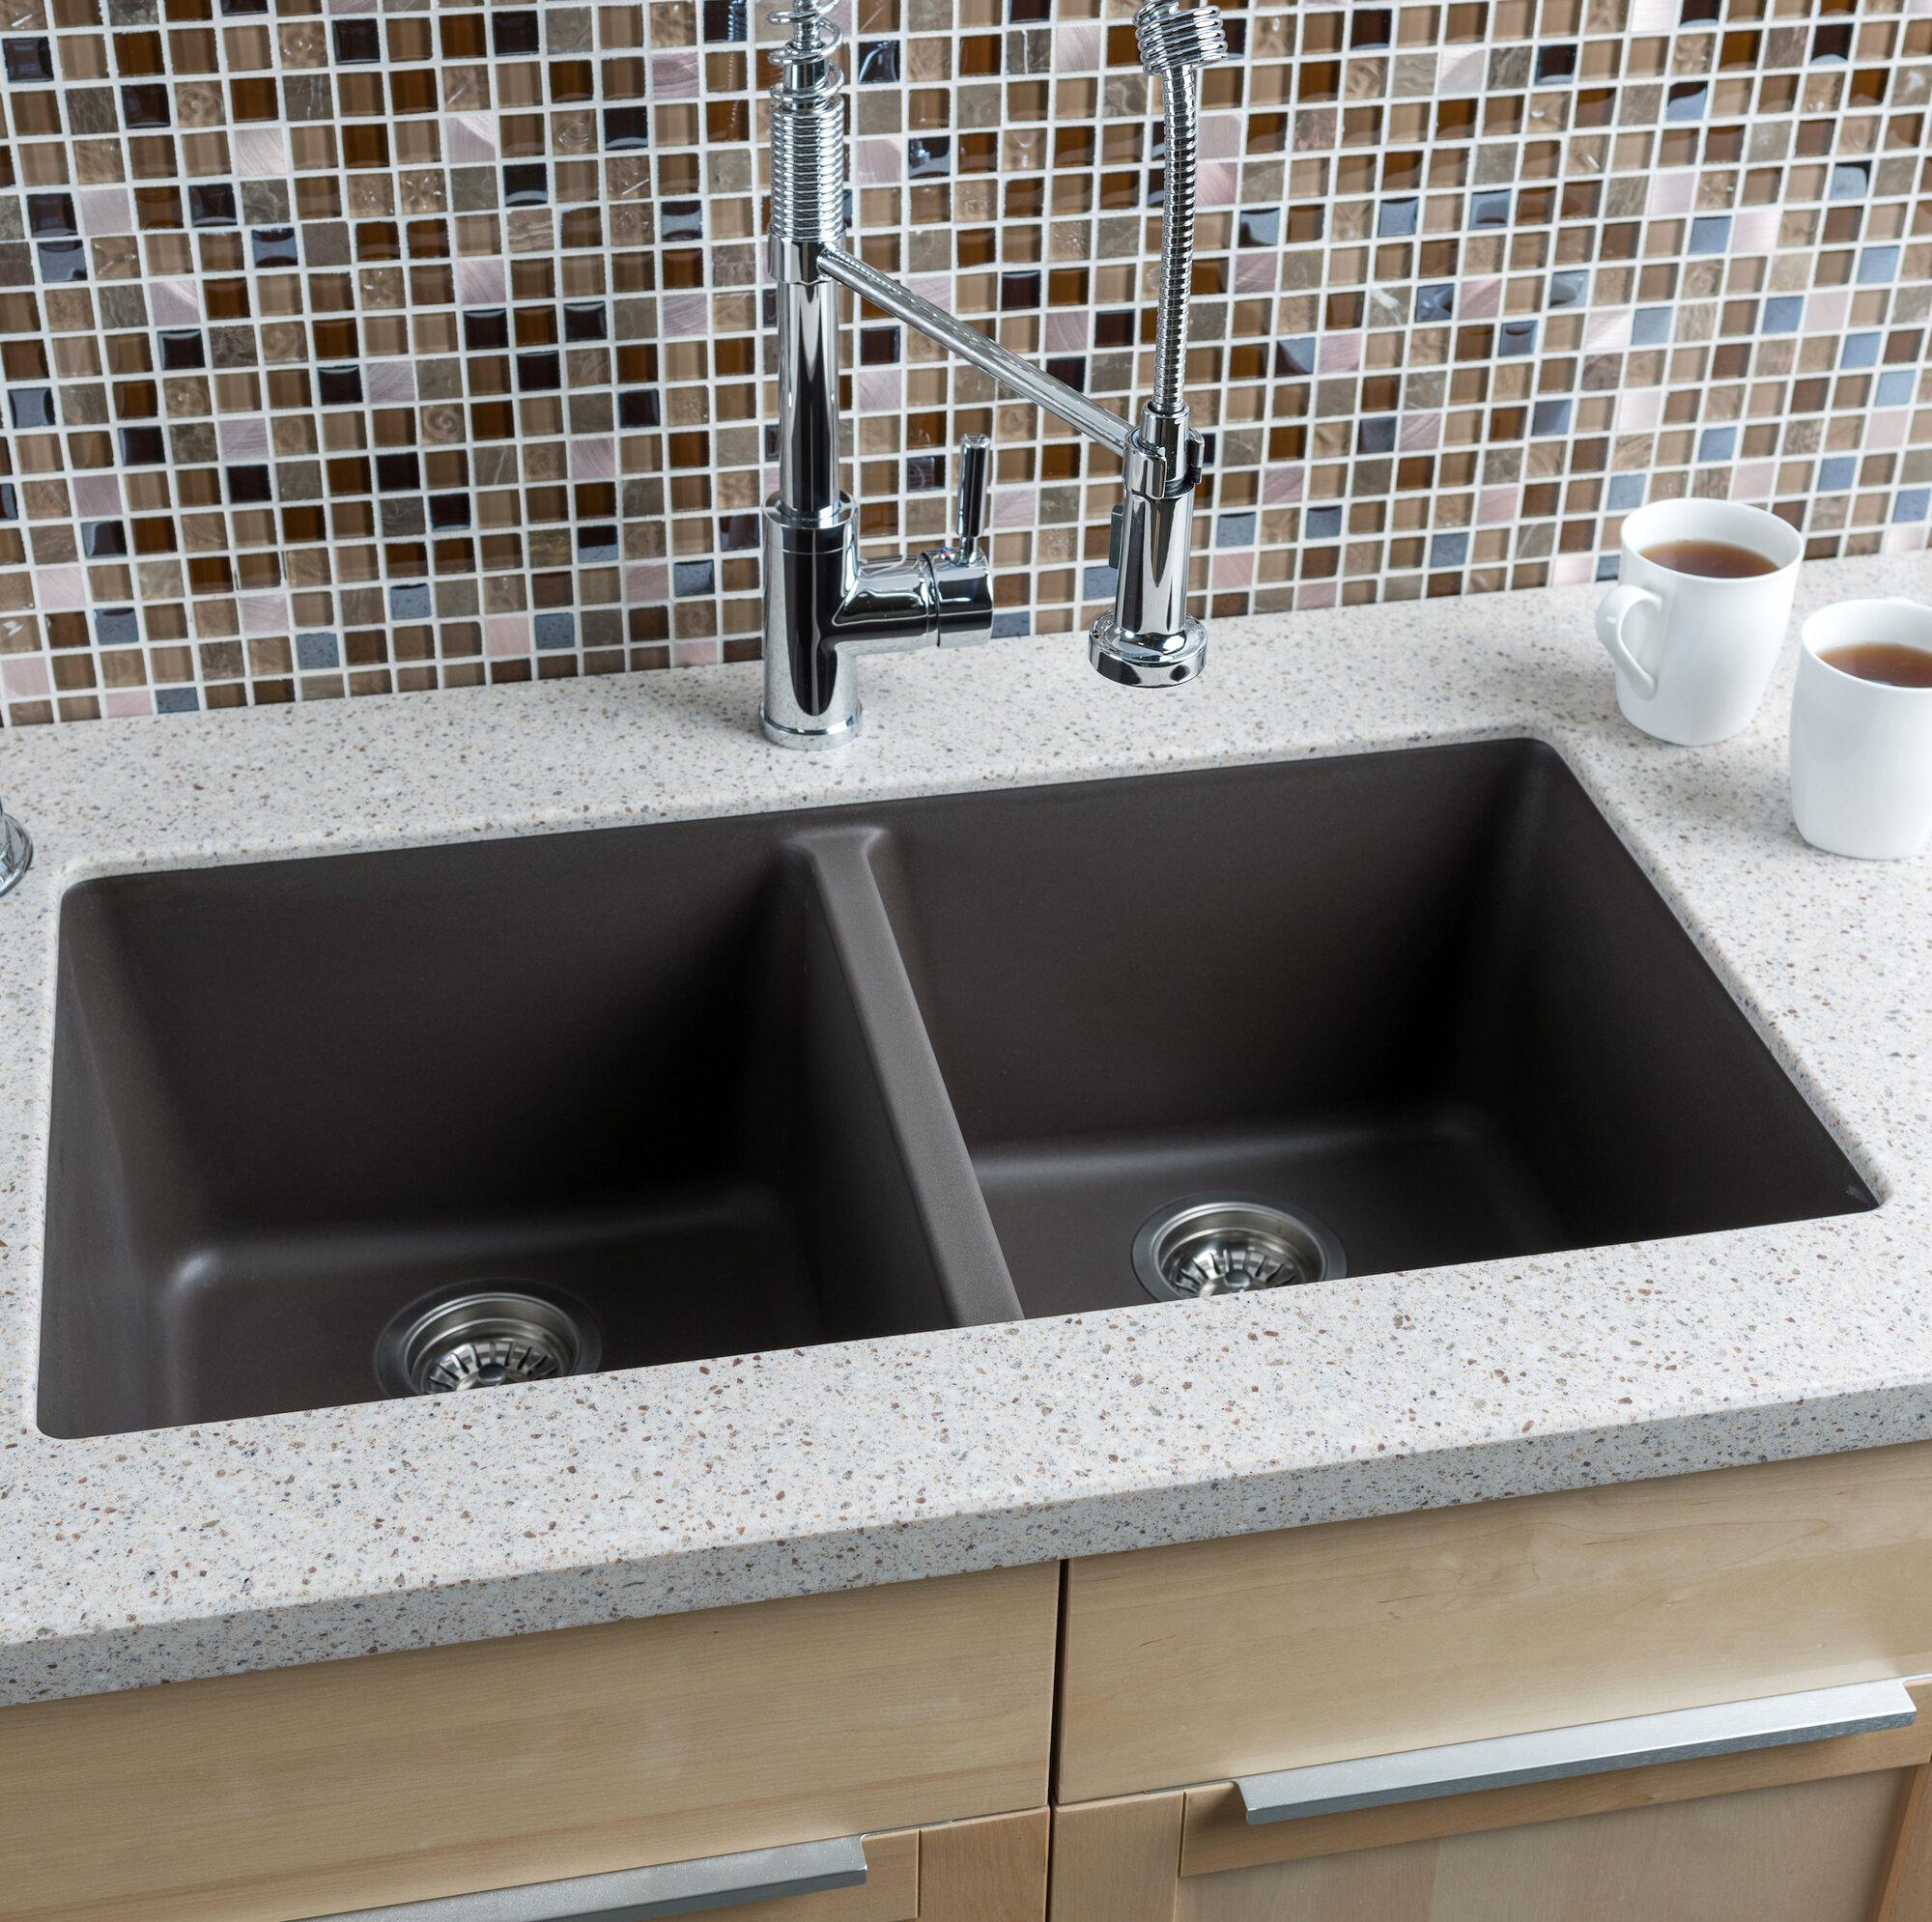 "Large Sink Kitchen: Hahn 33"" X 18.5"" Granite Extra Large Double Bowl Kitchen"